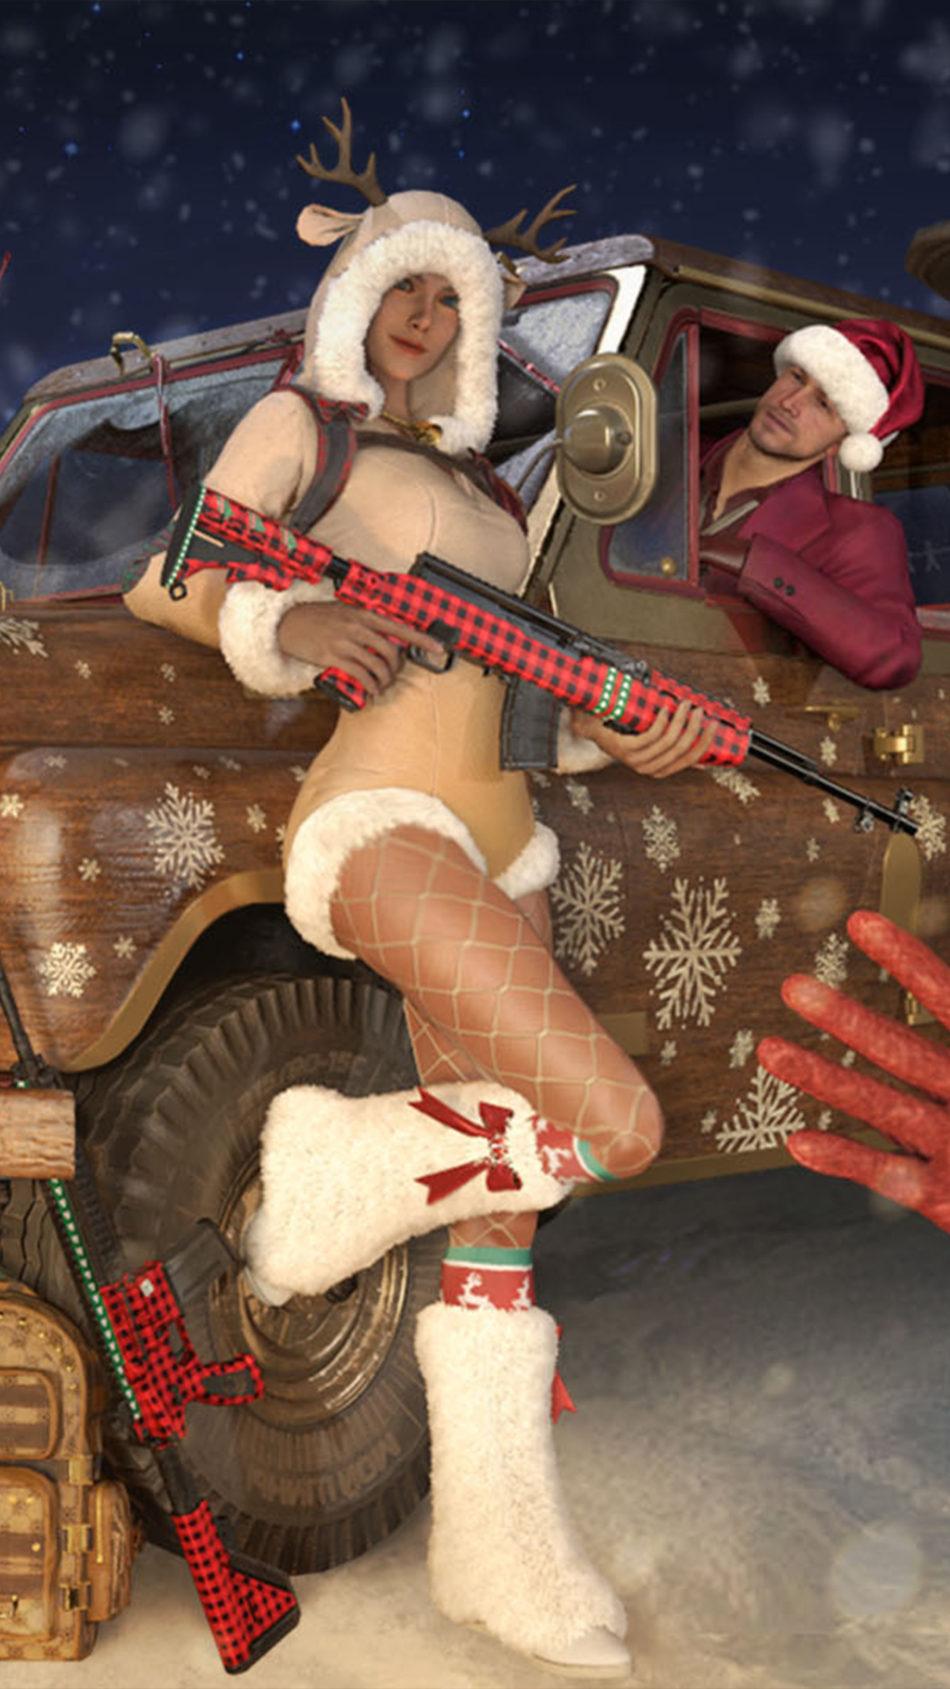 Christmas Skins Playerunknown's Battlegrounds Season 10 4K Ultra HD Mobile Wallpaper